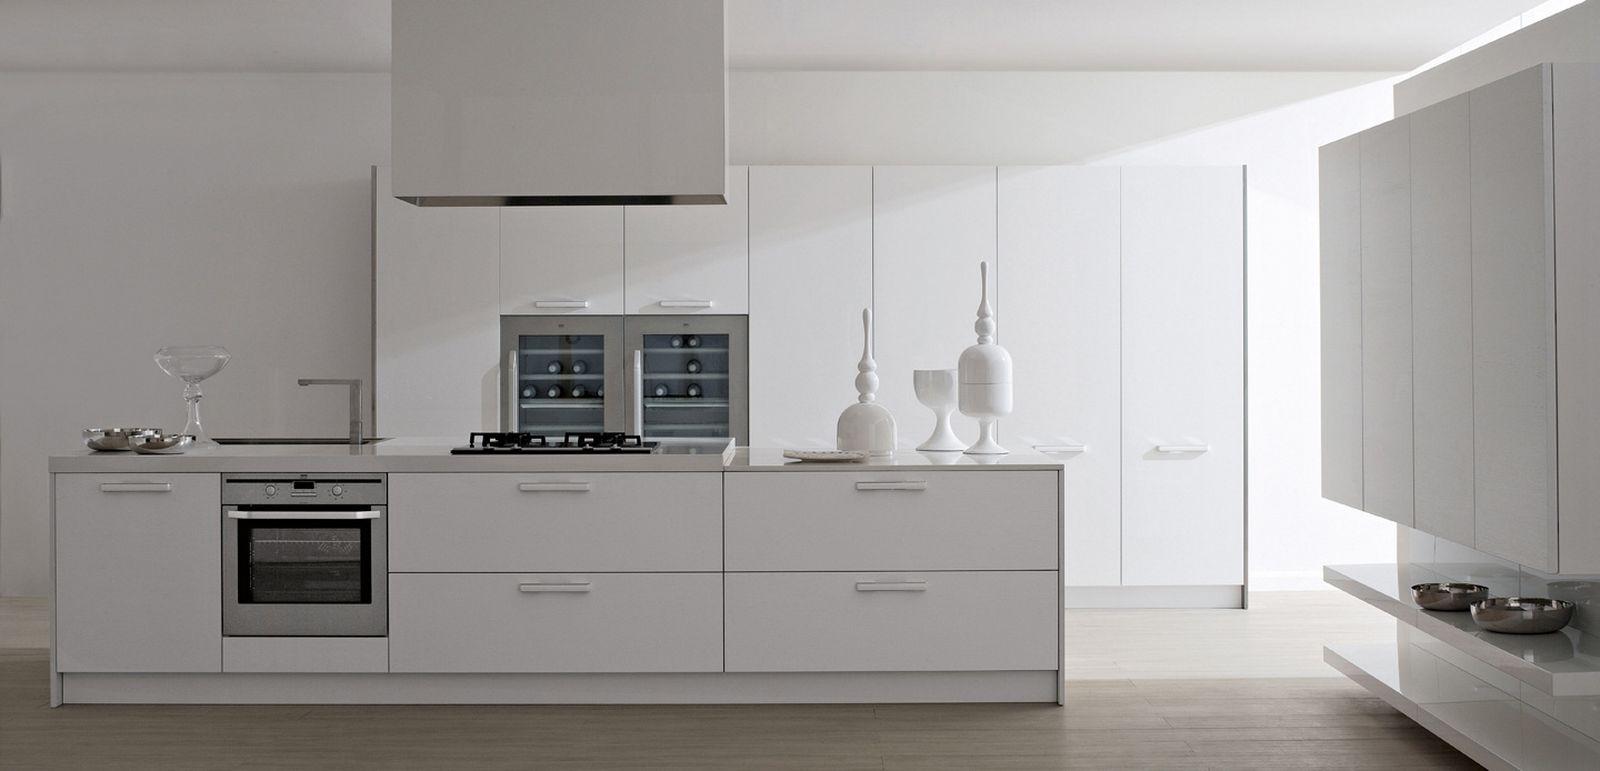 Quartet kitchens fitted kitchens marbella bathrooms mijas costa new kitchen benalmadena - Stylishly modern kitchen islands additional work surface ...